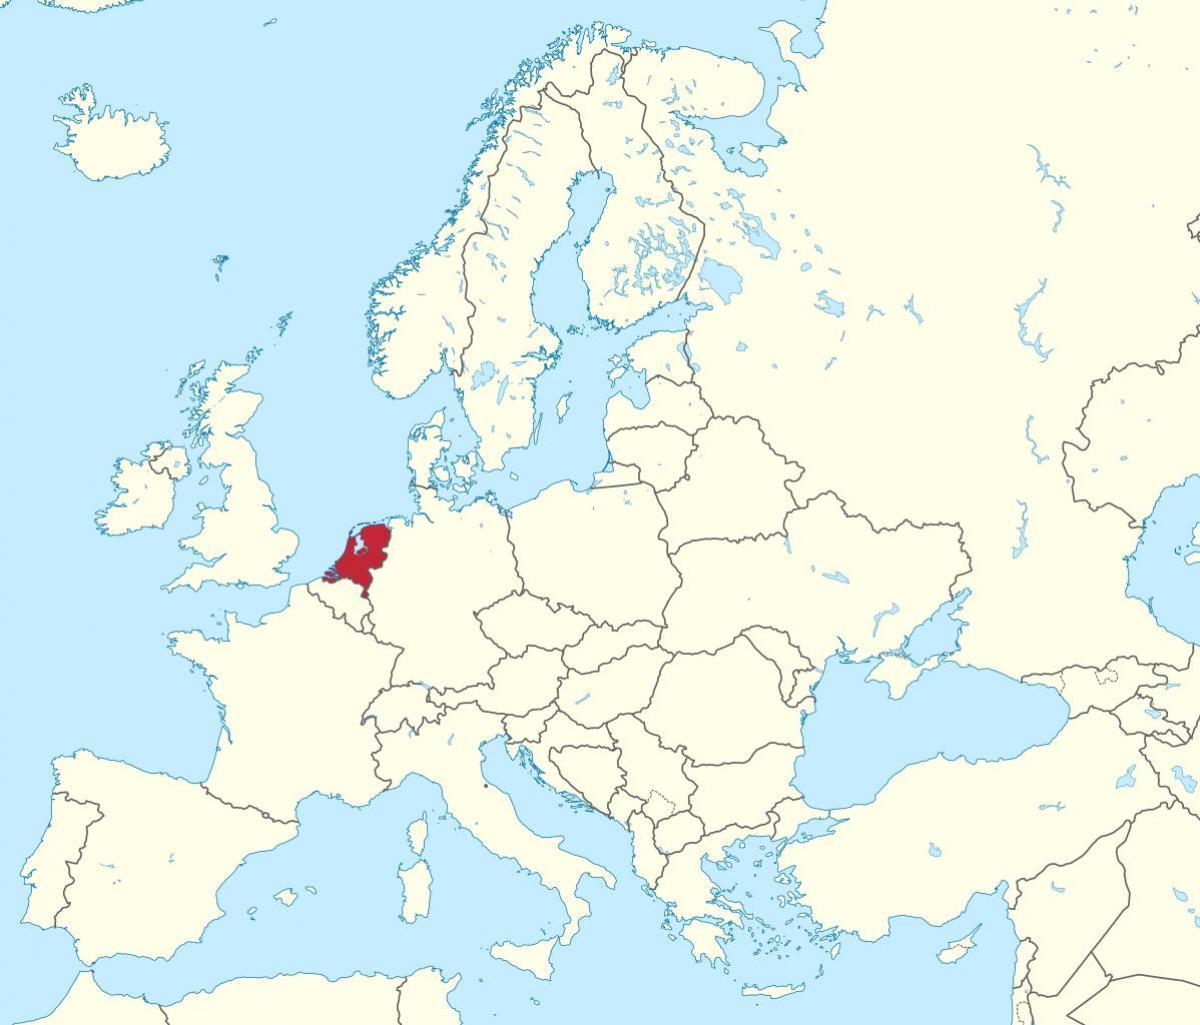 Europe Map Netherlands Netherlands Map Europe Western Europe